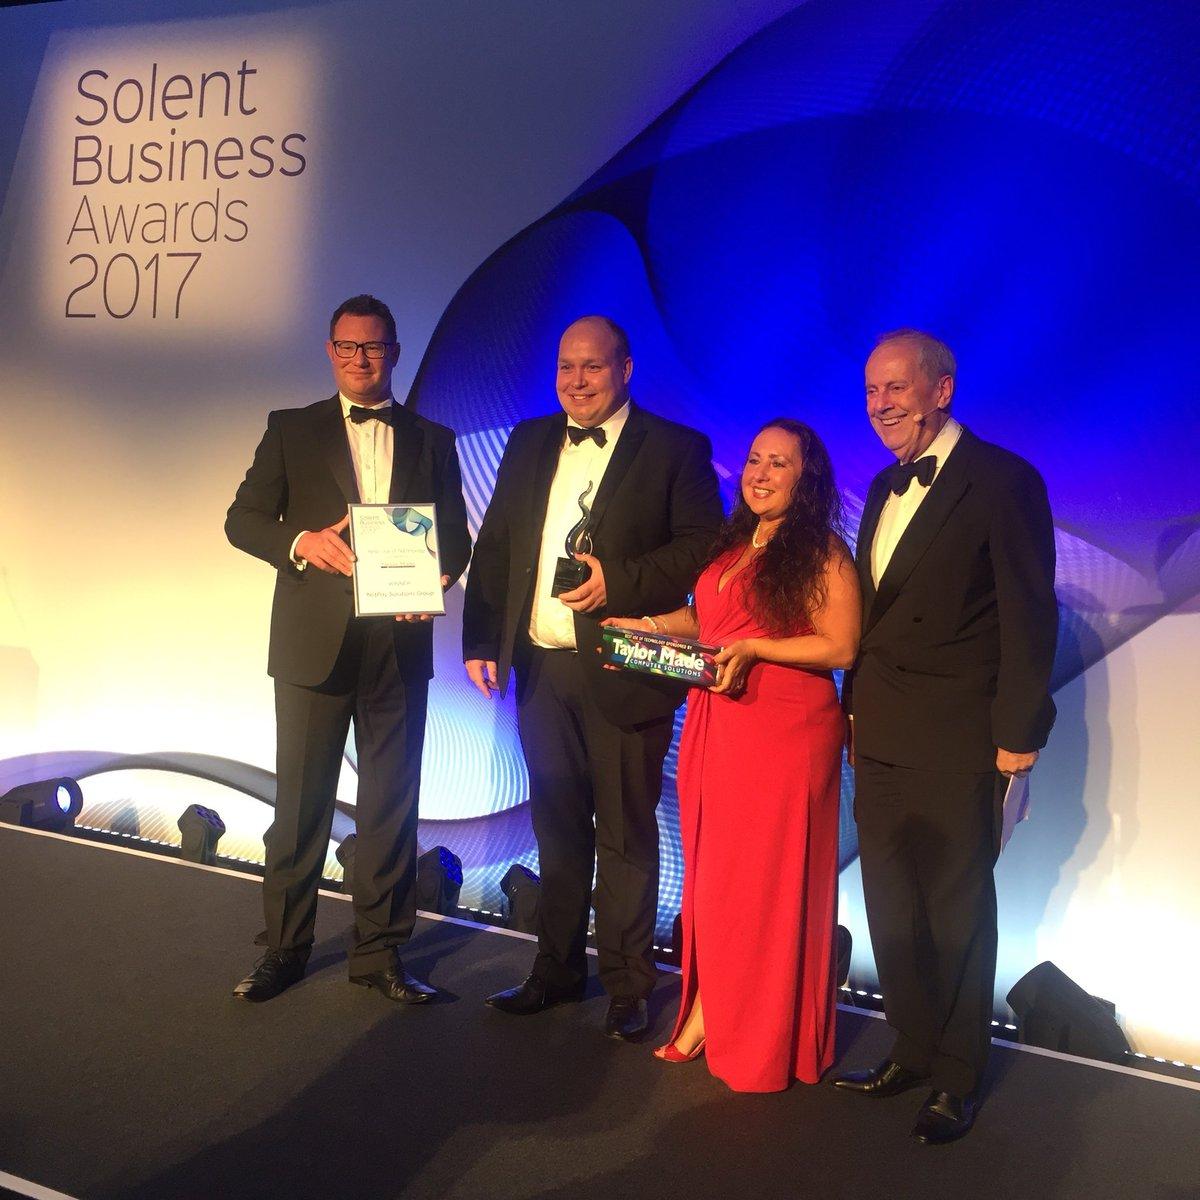 Congratulations @NetPayGroup! for winning The Best Use of Technology  Award! #SolentBA #Winners <br>http://pic.twitter.com/3m2uG1RLu4